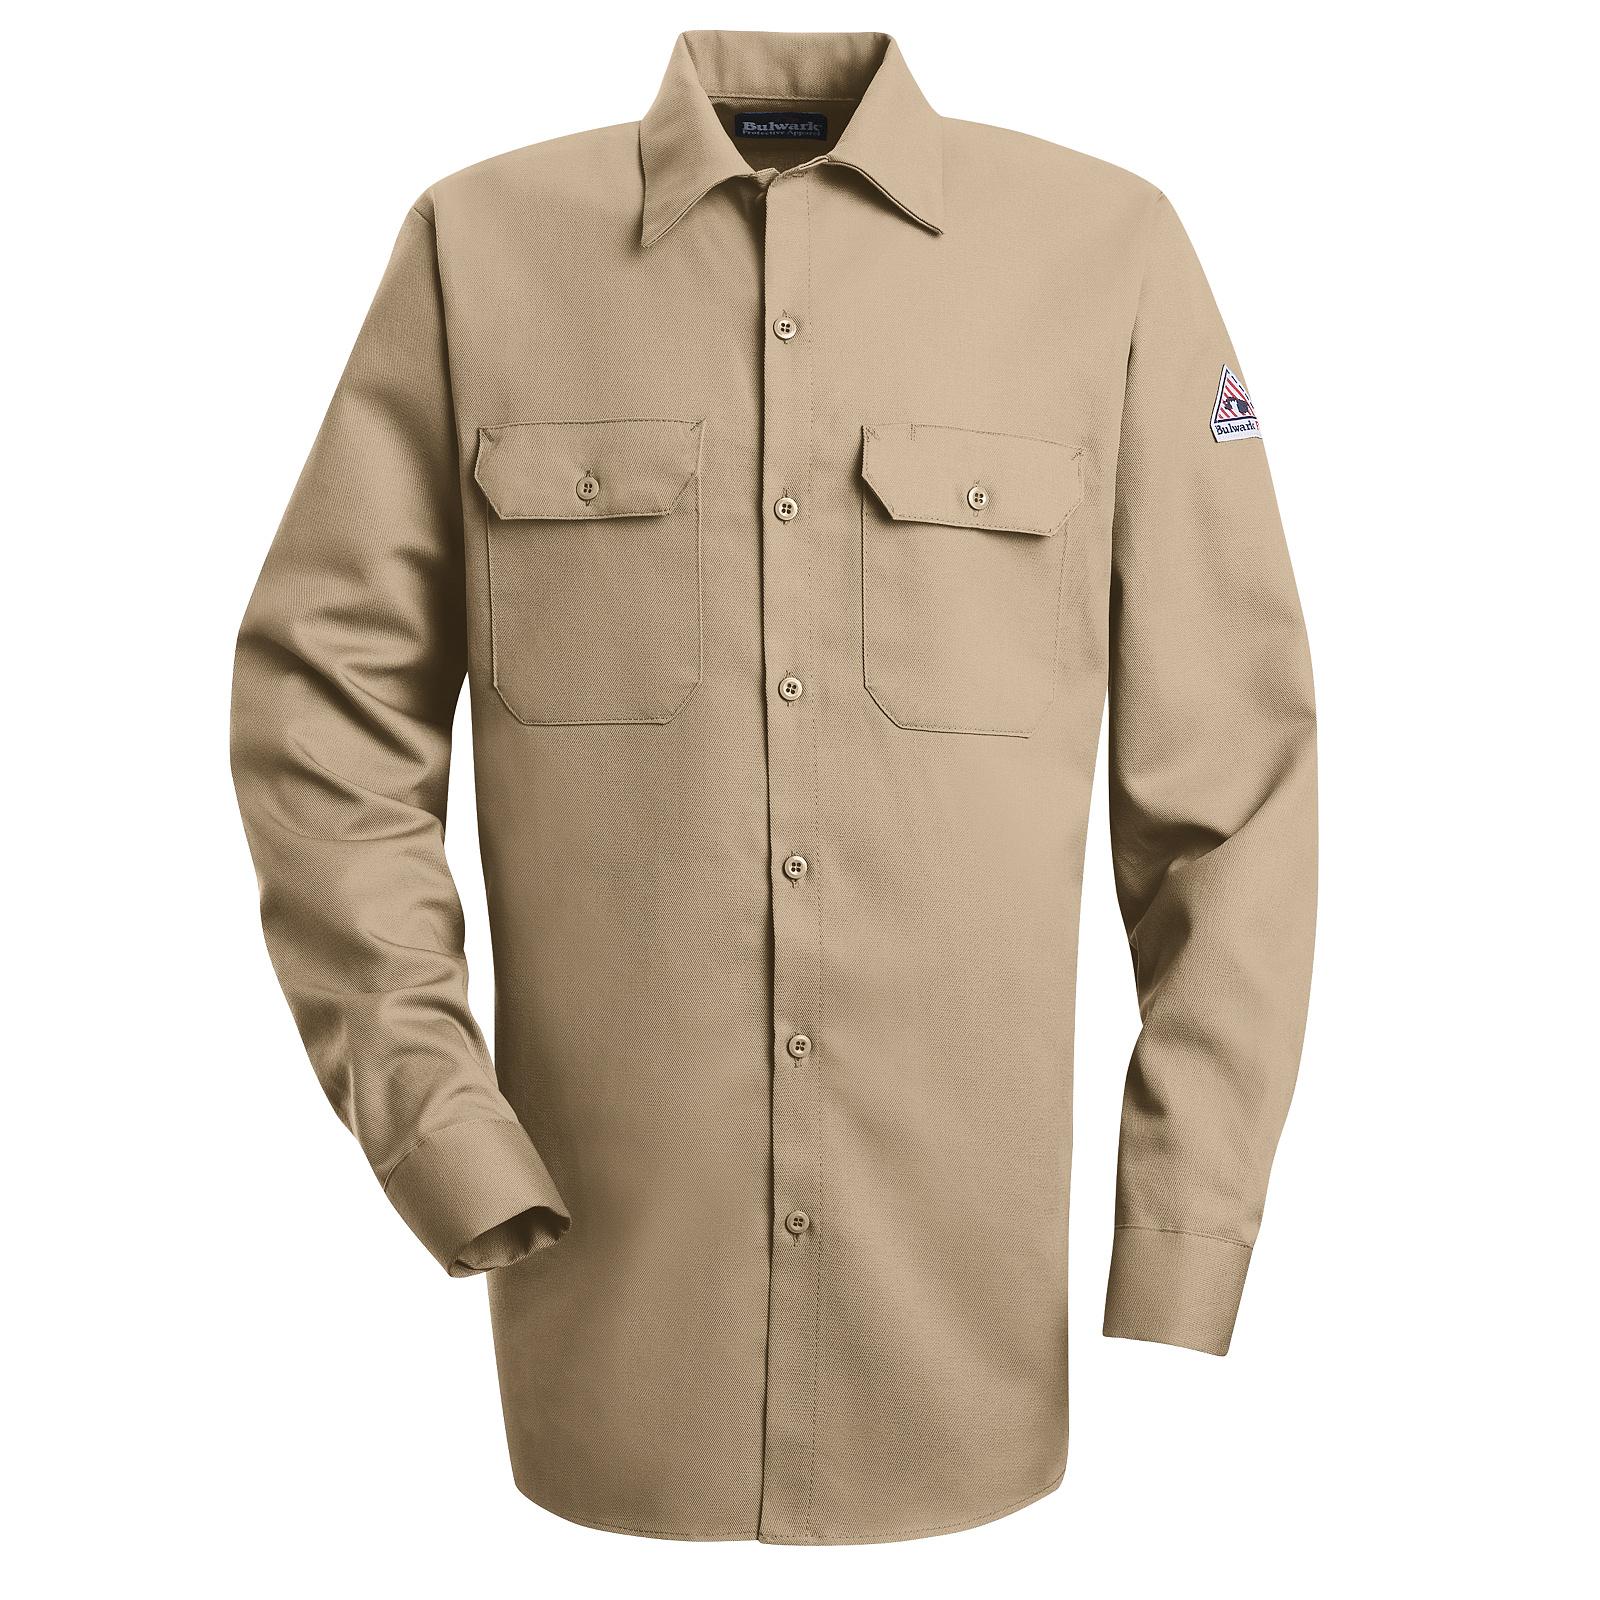 Work Shirt -EXCEL FR® ComforTouch® - 7 oz.